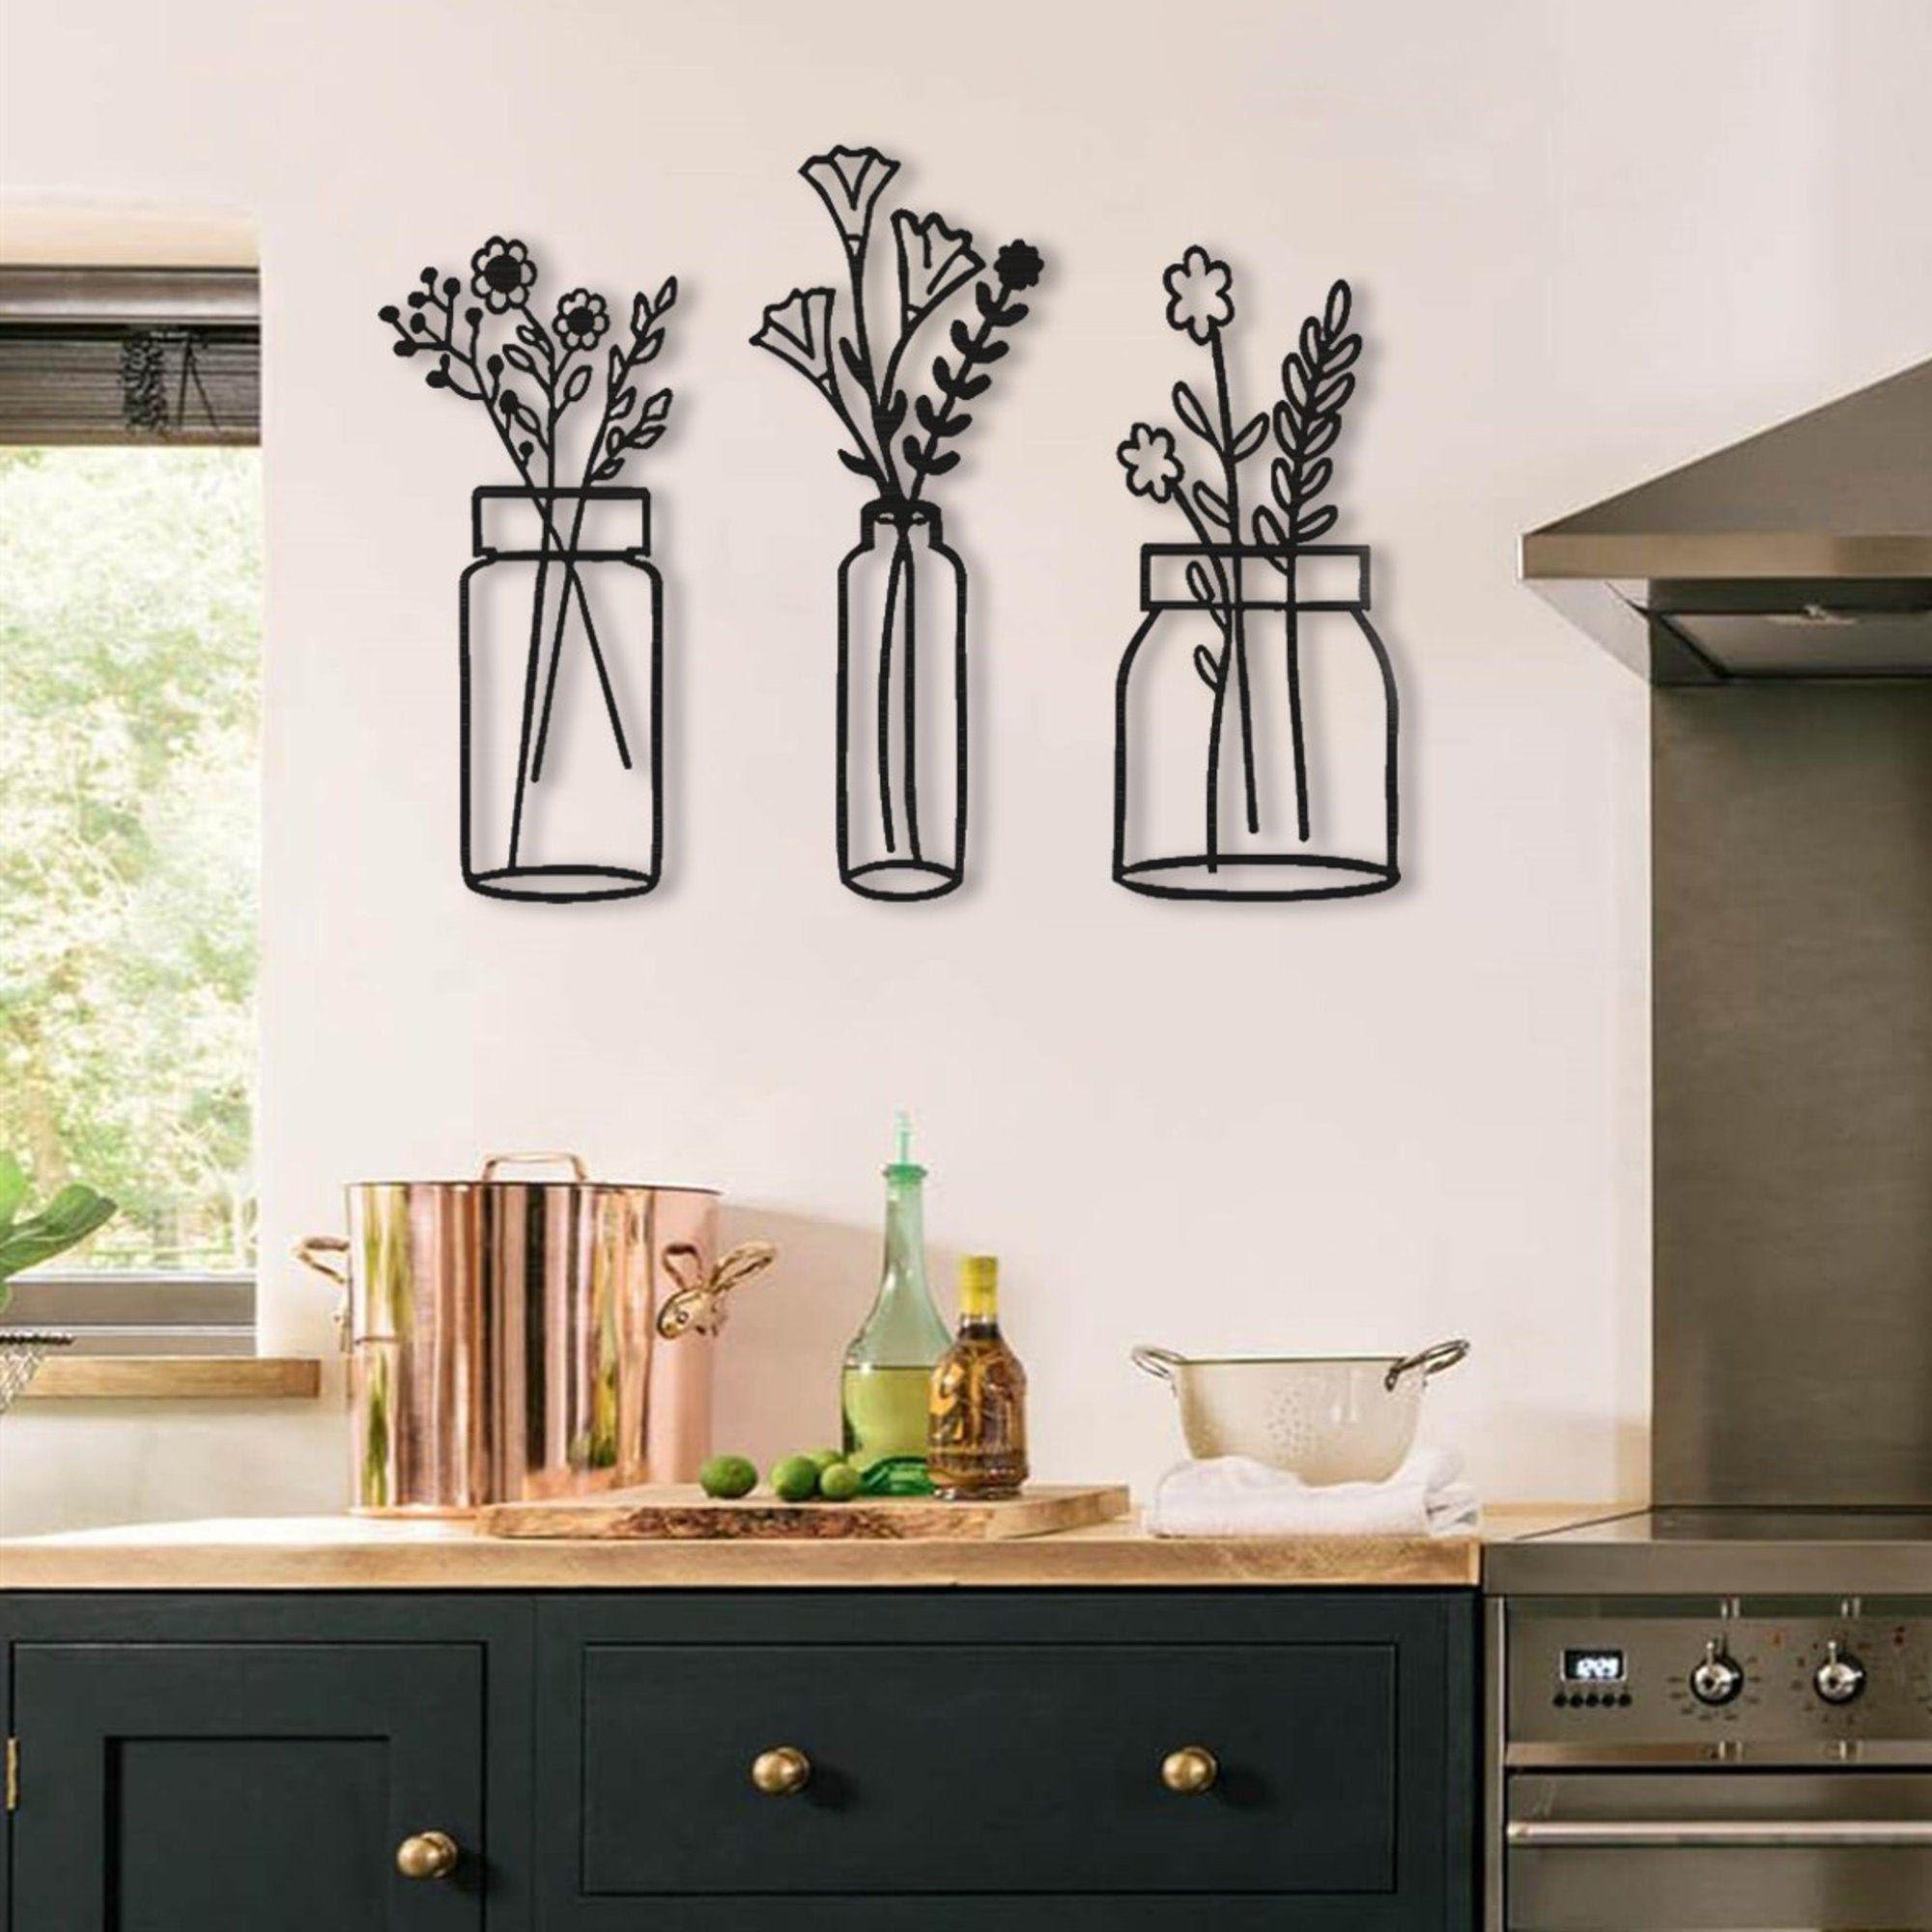 Kitchen Wall Decorations Art